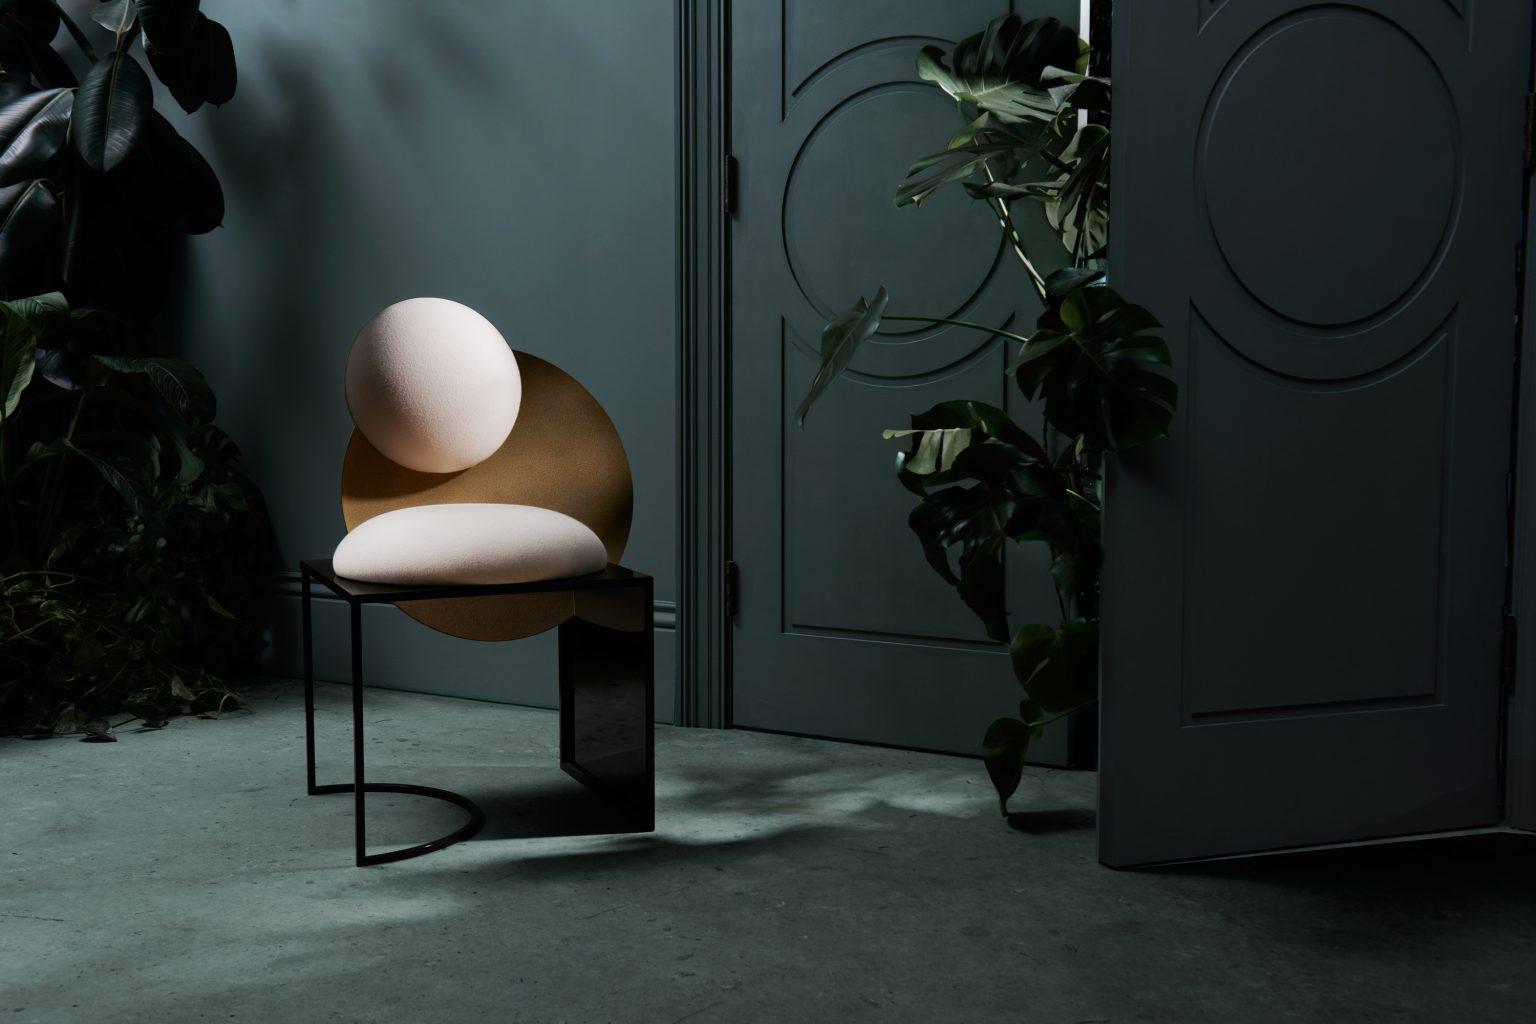 Biennale Interieur - Belgium's leading design and interior event - Celeste-chair-01-bohinc-studio-philippe-fragniere-lr.jpg